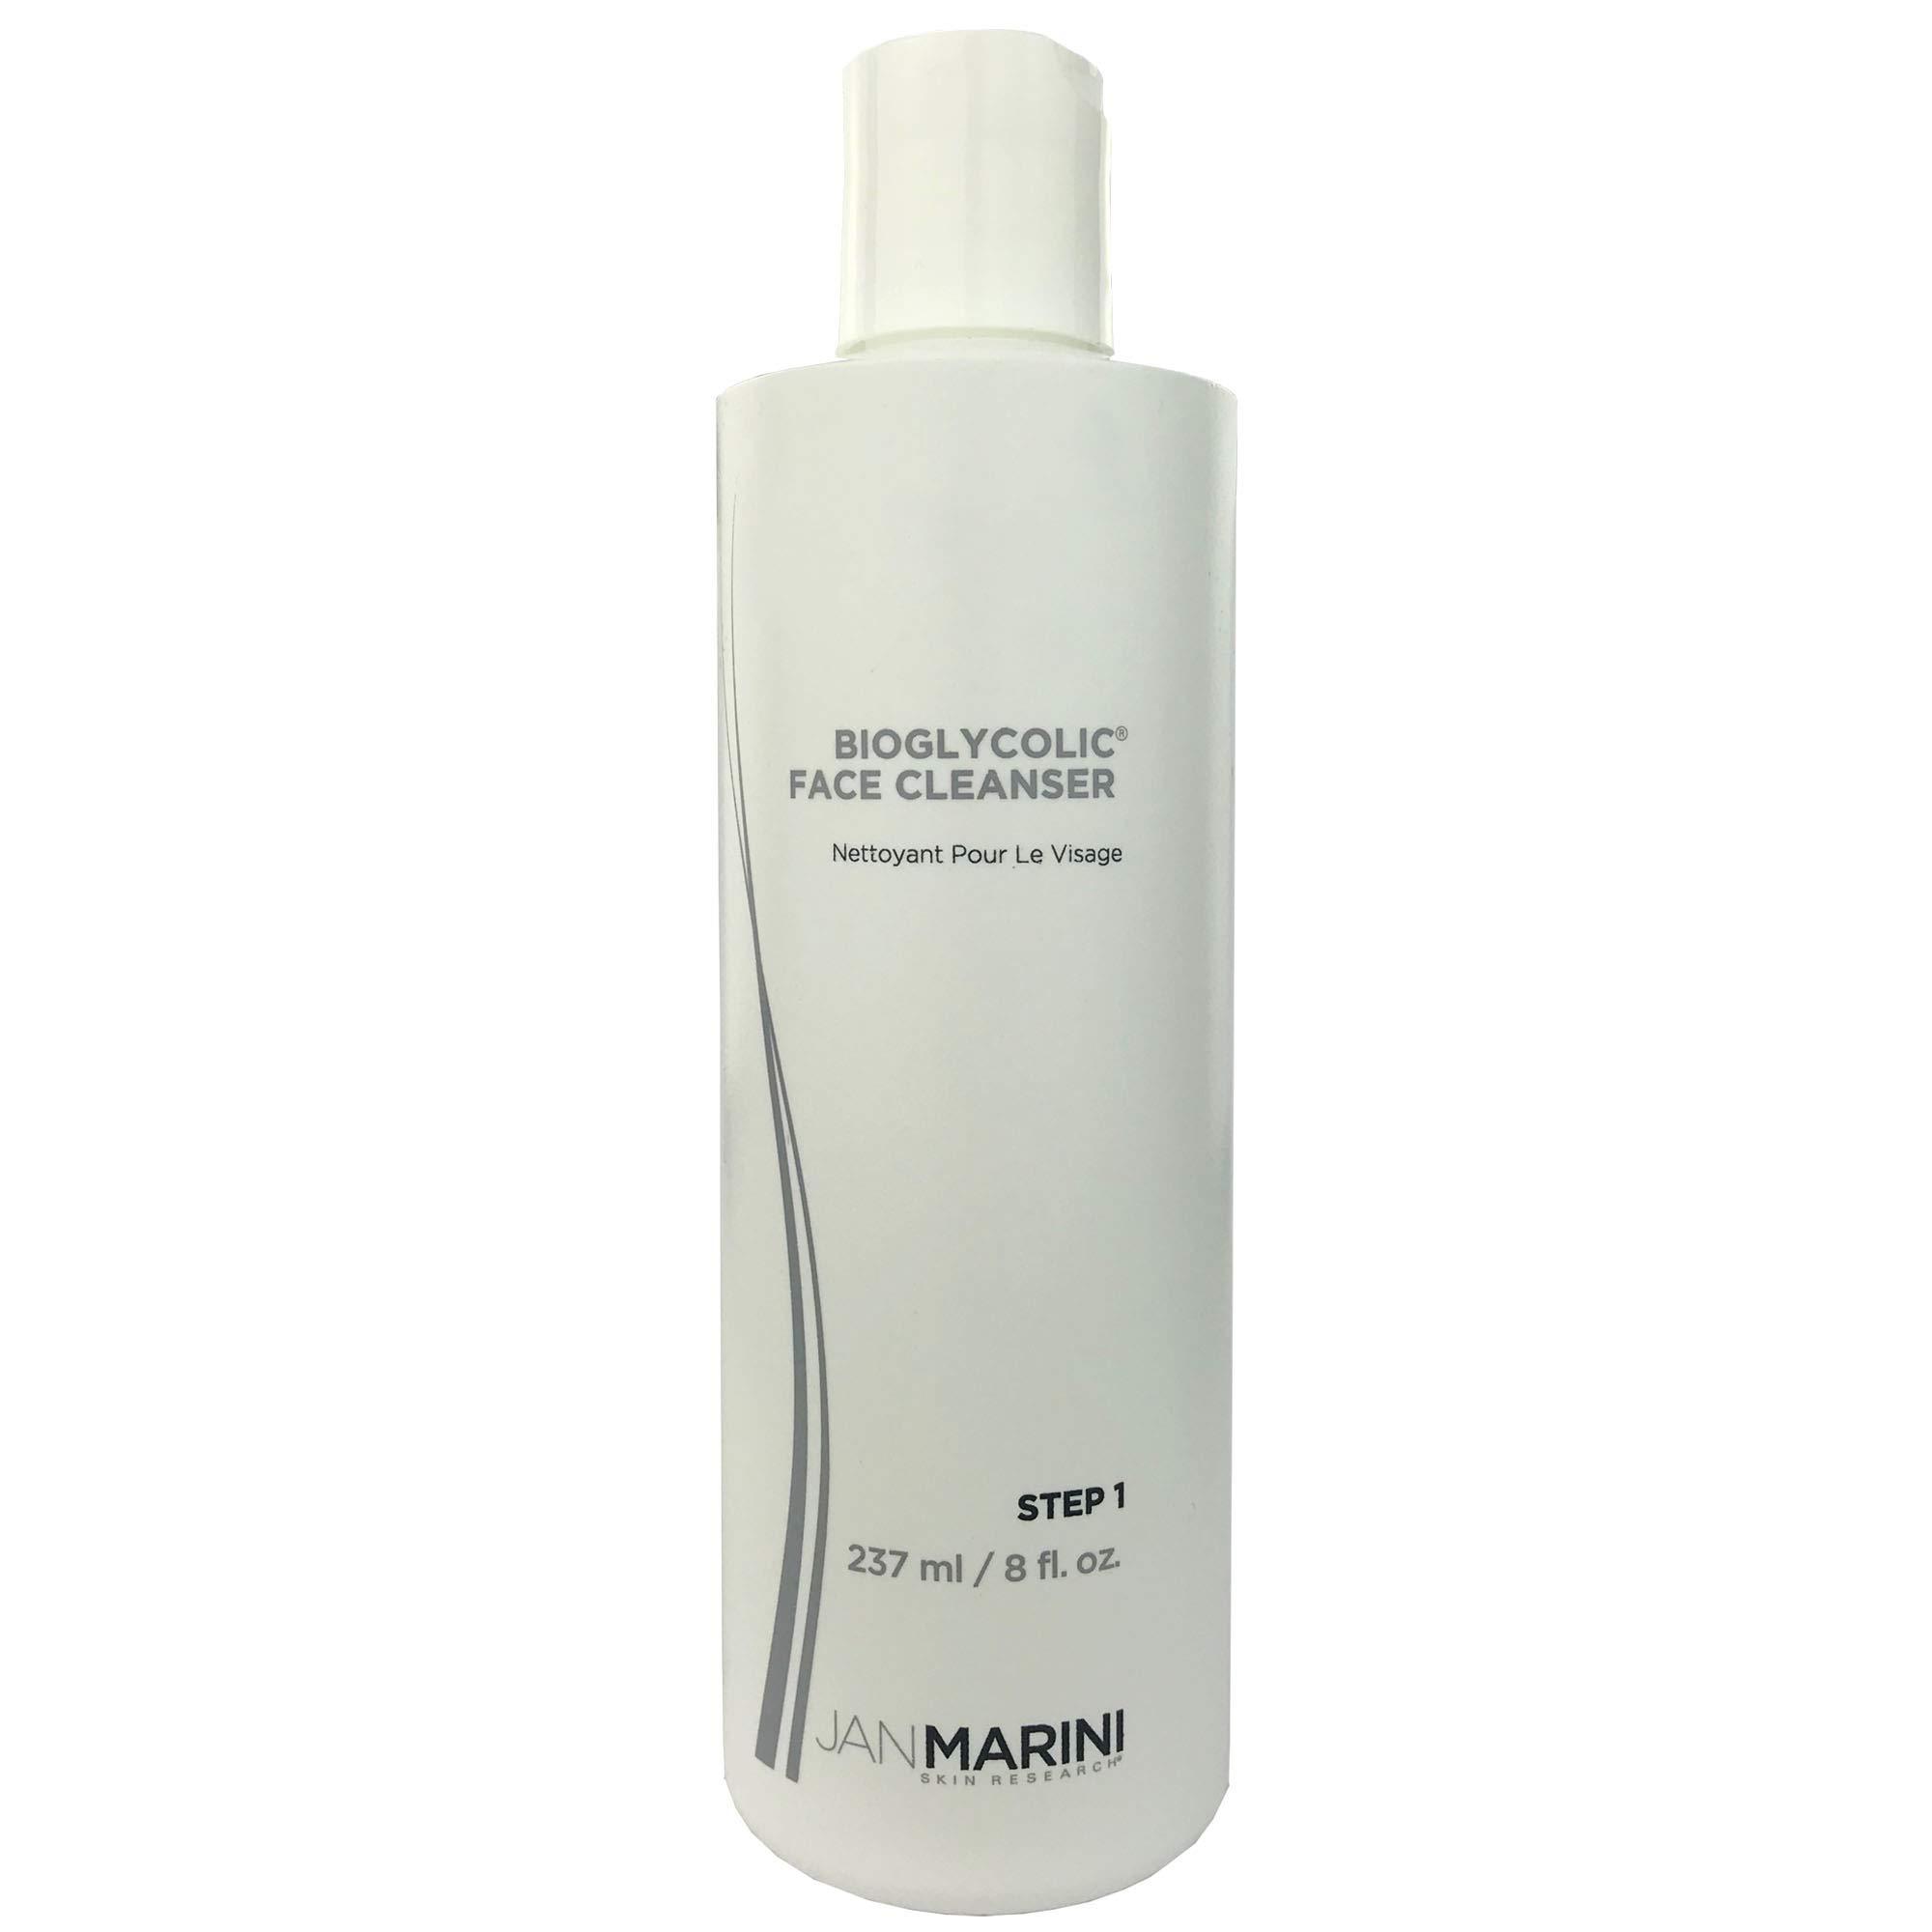 Jan Marini Skin Research Bioglycolic Face Cleanser, 8 fl. oz. by Jan Marini Skin Research